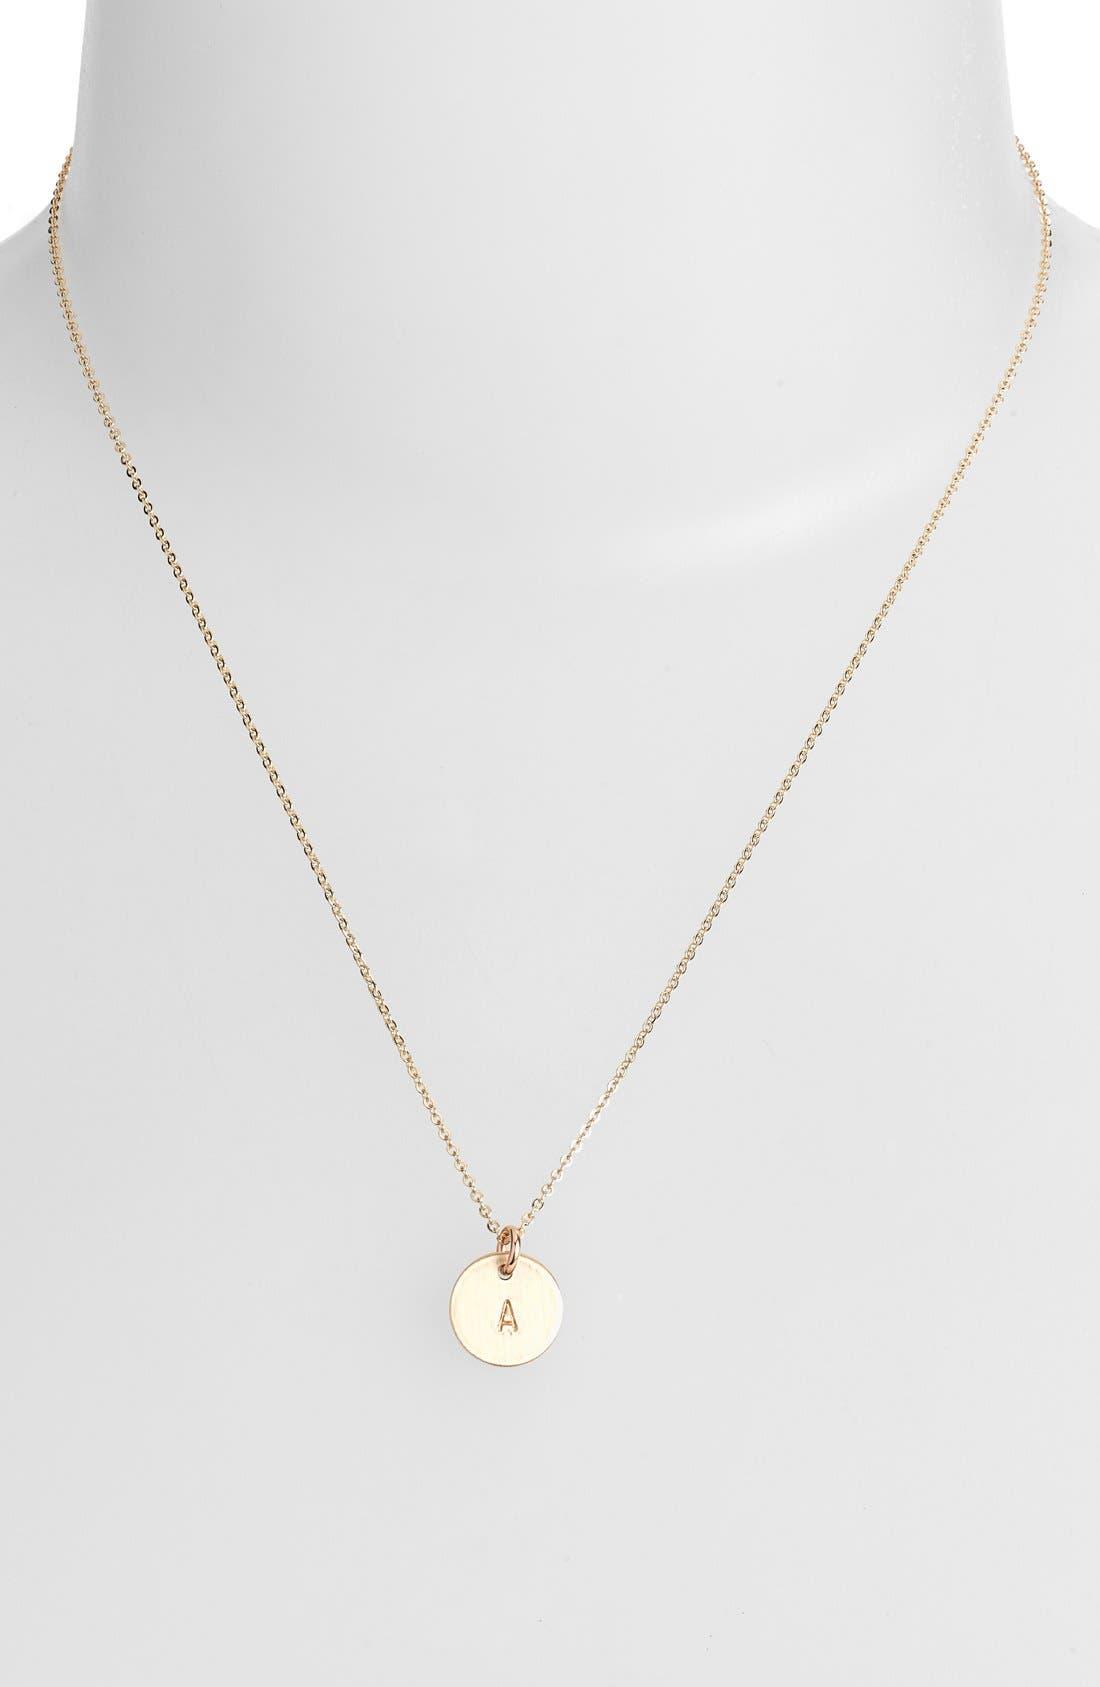 14k-Gold Fill Initial Mini Circle Necklace,                             Alternate thumbnail 2, color,                             14K GOLD FILL A